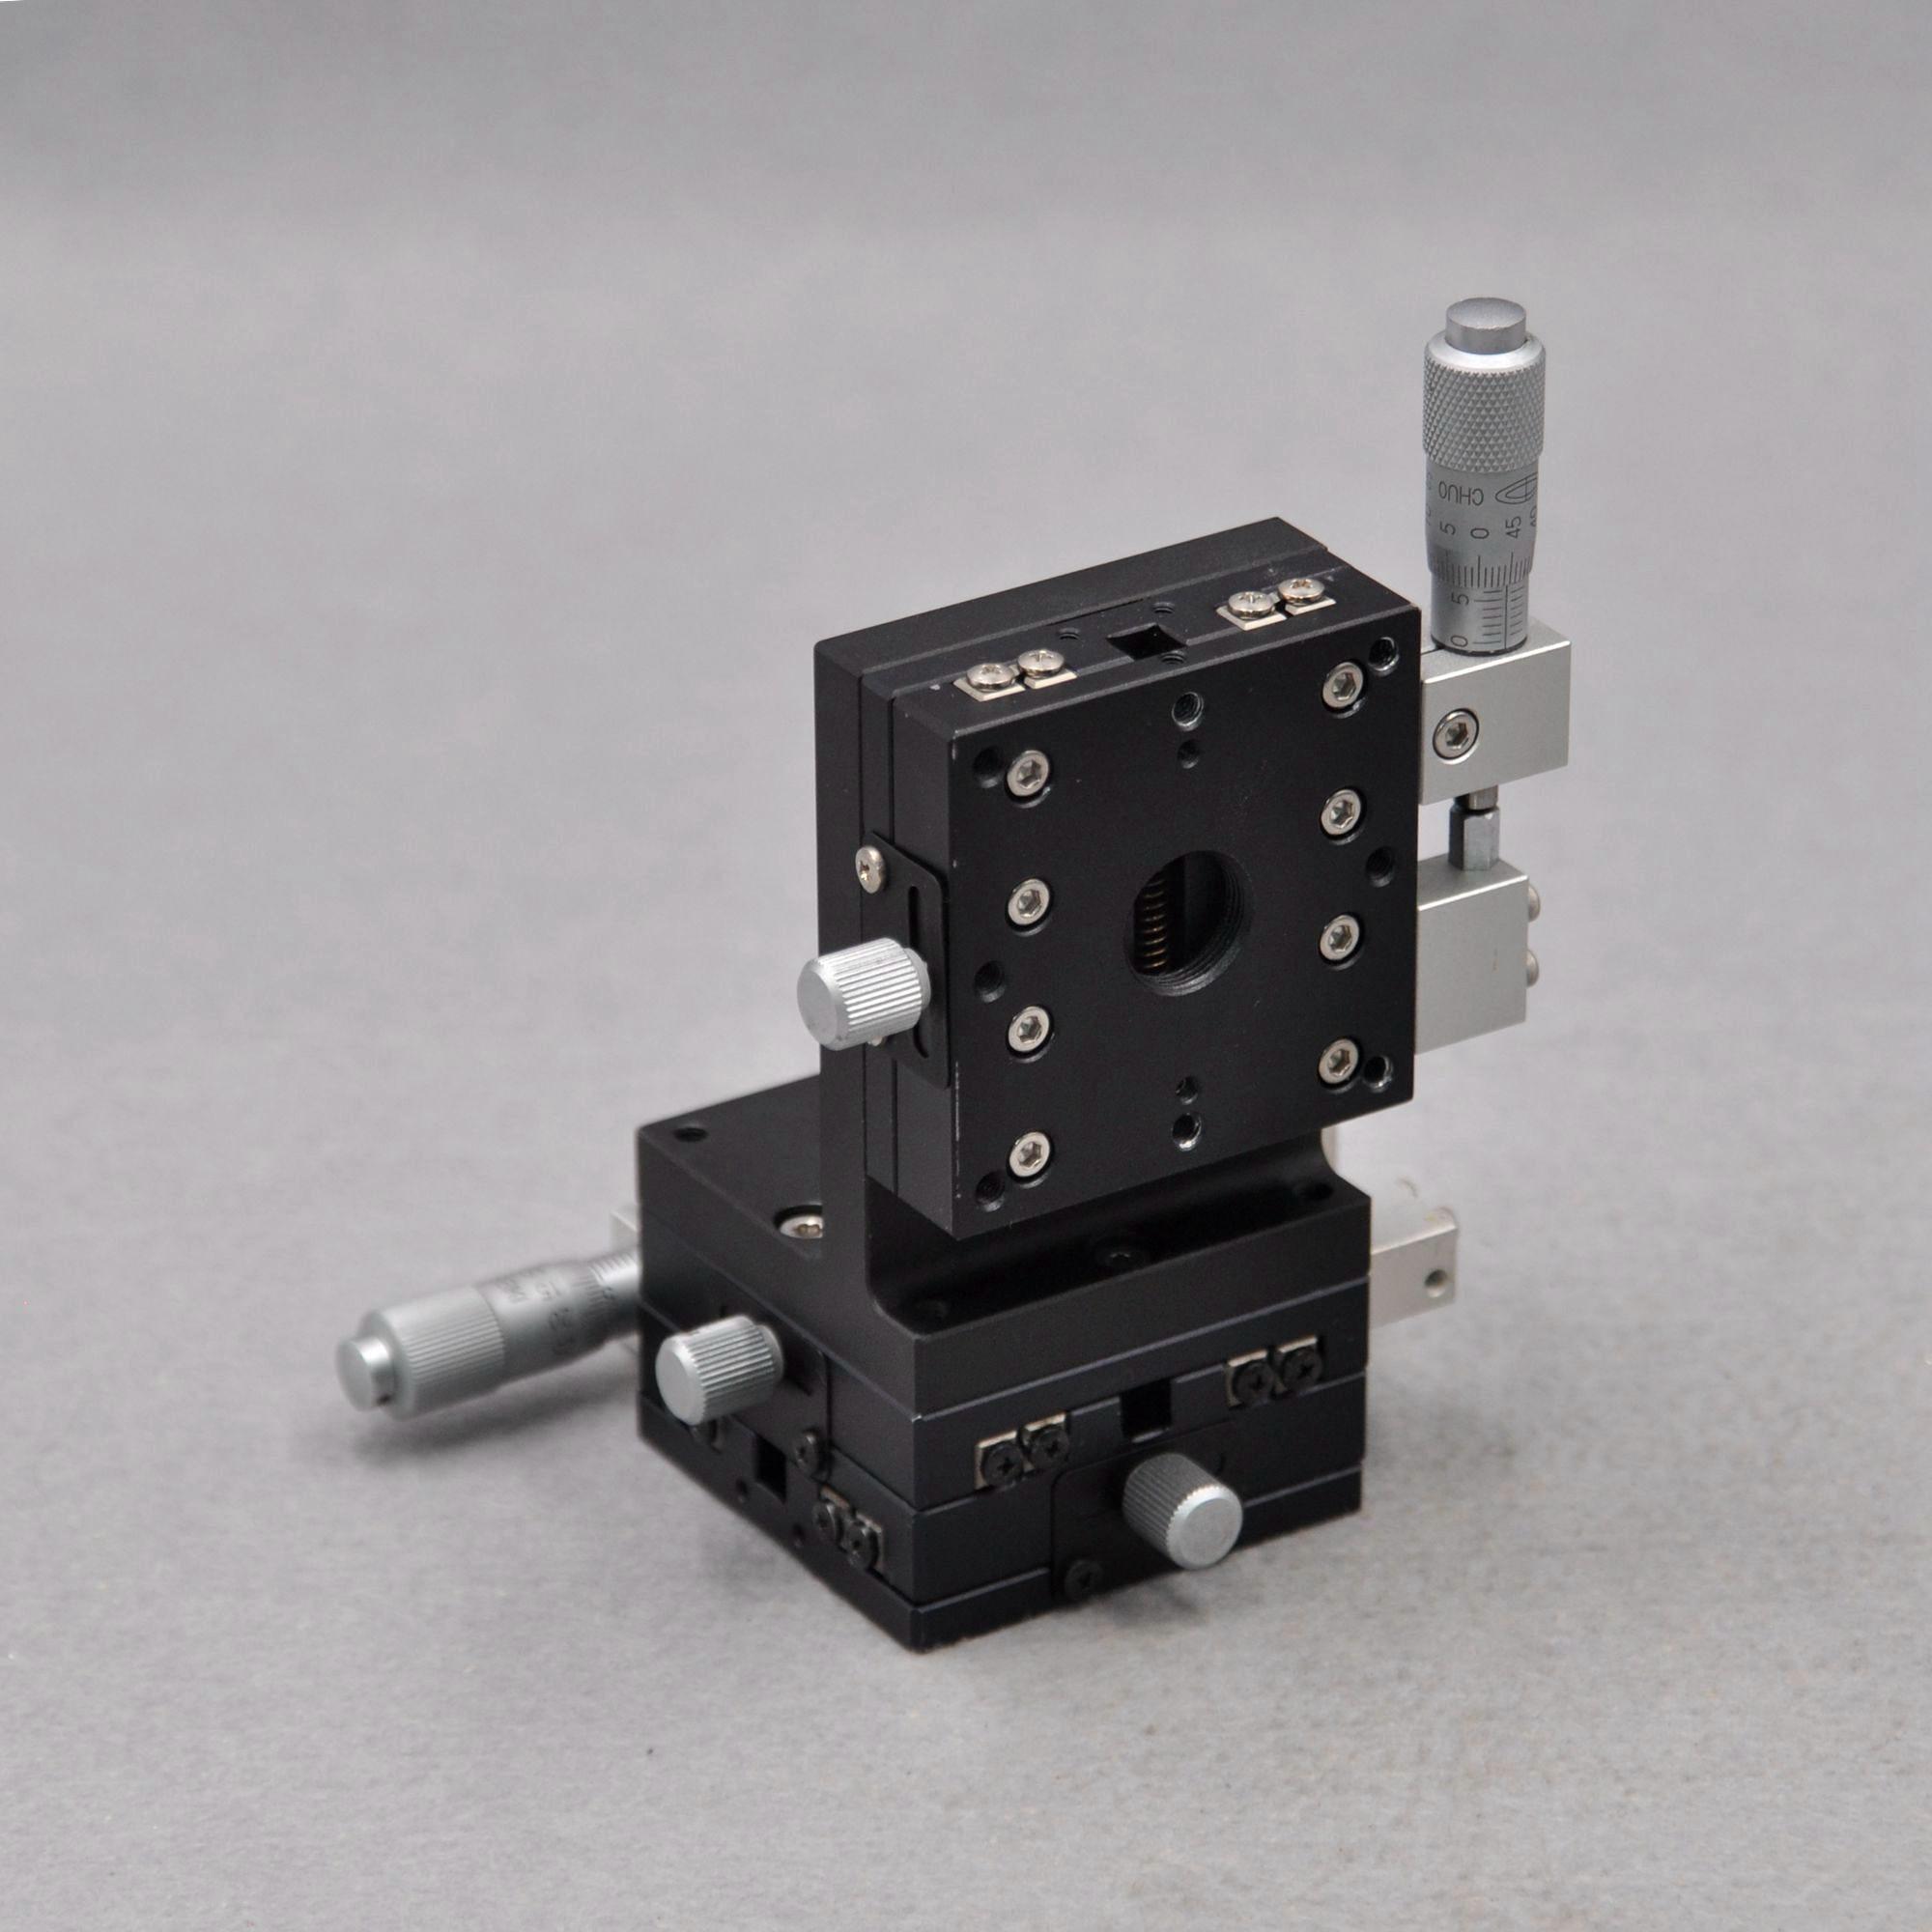 CHUO XYZ axis three-dimensional LS-647-S1 LS-647-R1 LD-647-S1 manual cross rail displacement lifting slide enlarge